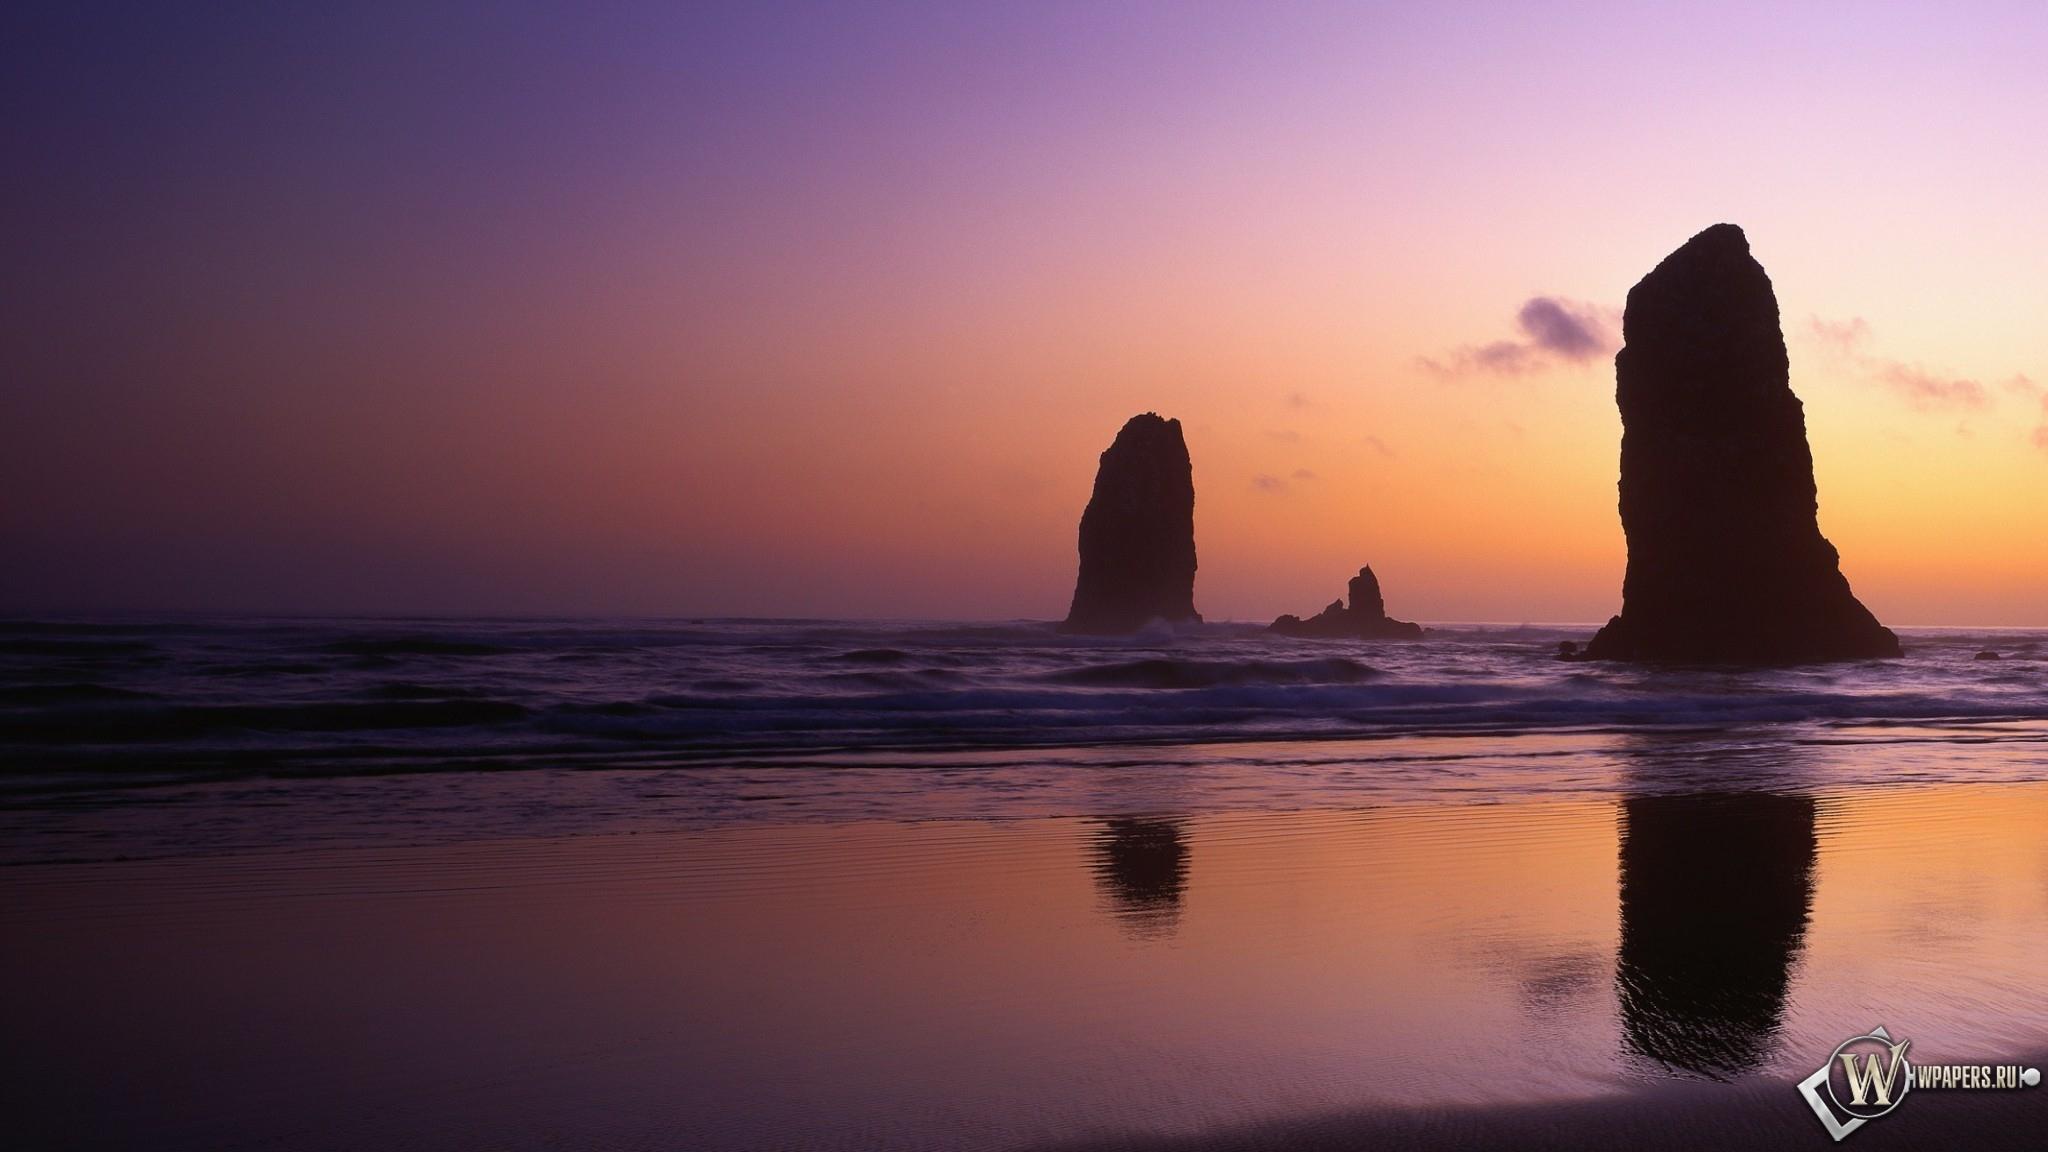 Скалы у берега 2048x1152